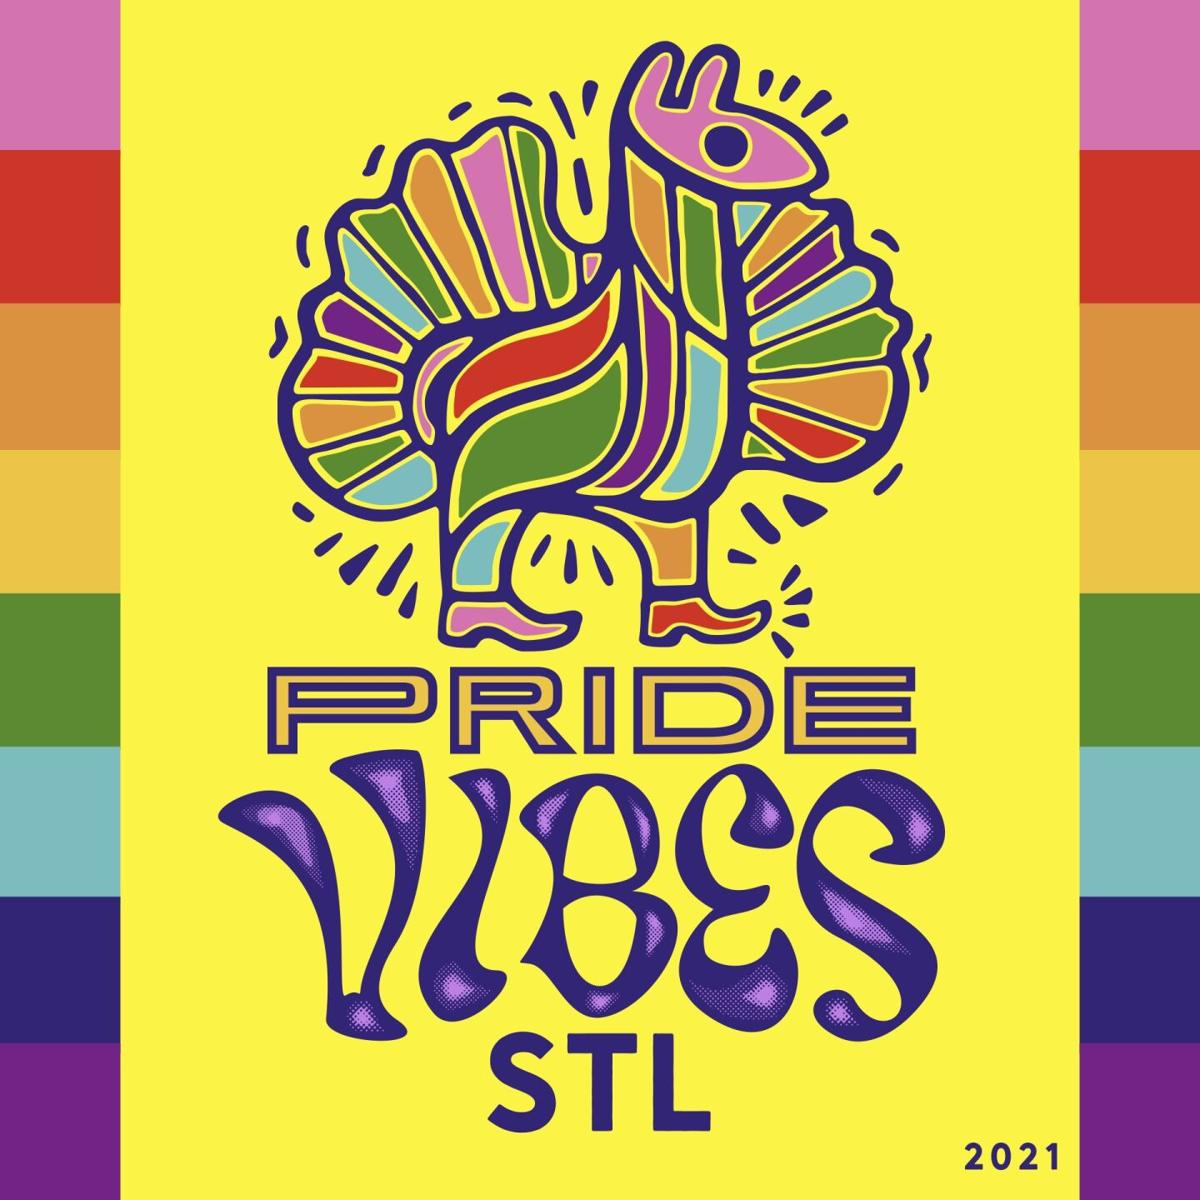 Pride Vibes STL logo